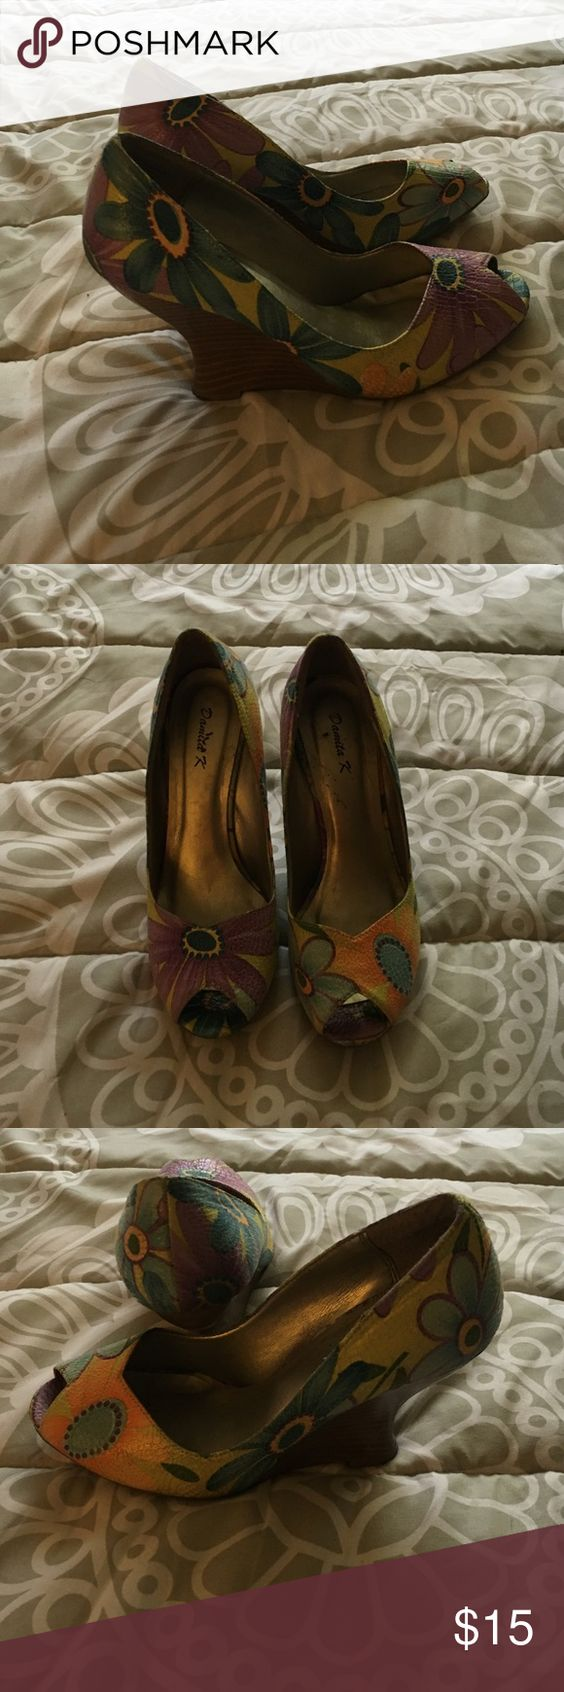 Floral Peep Toe Wedges Spunky floral wedges. Worn a few times. Danita K Shoes Wedges